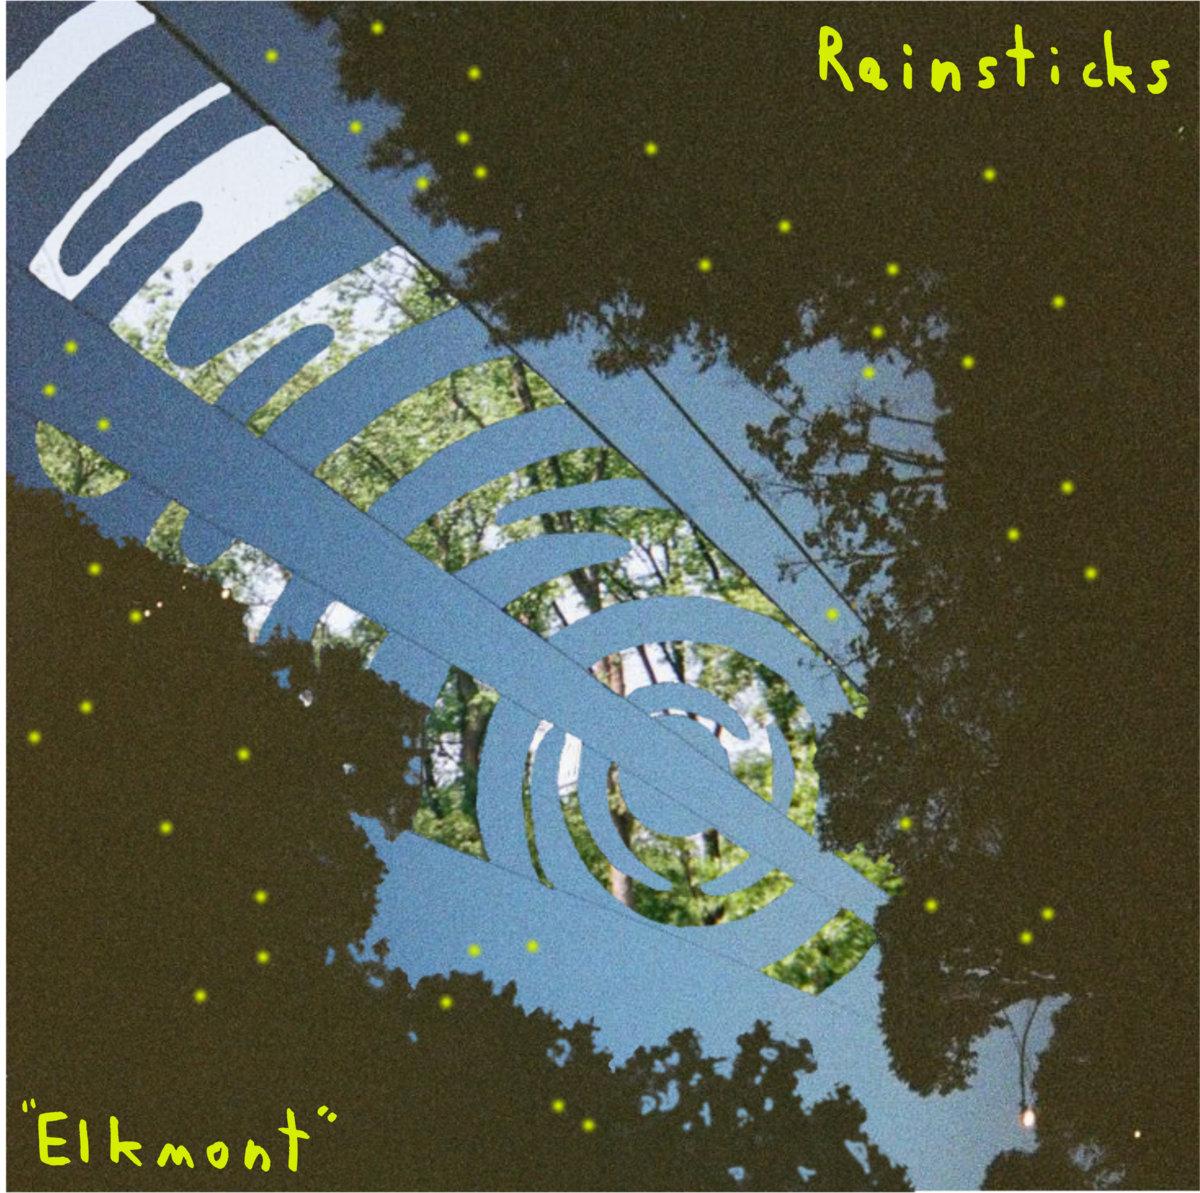 Rainsticks – Atlanta Traffic